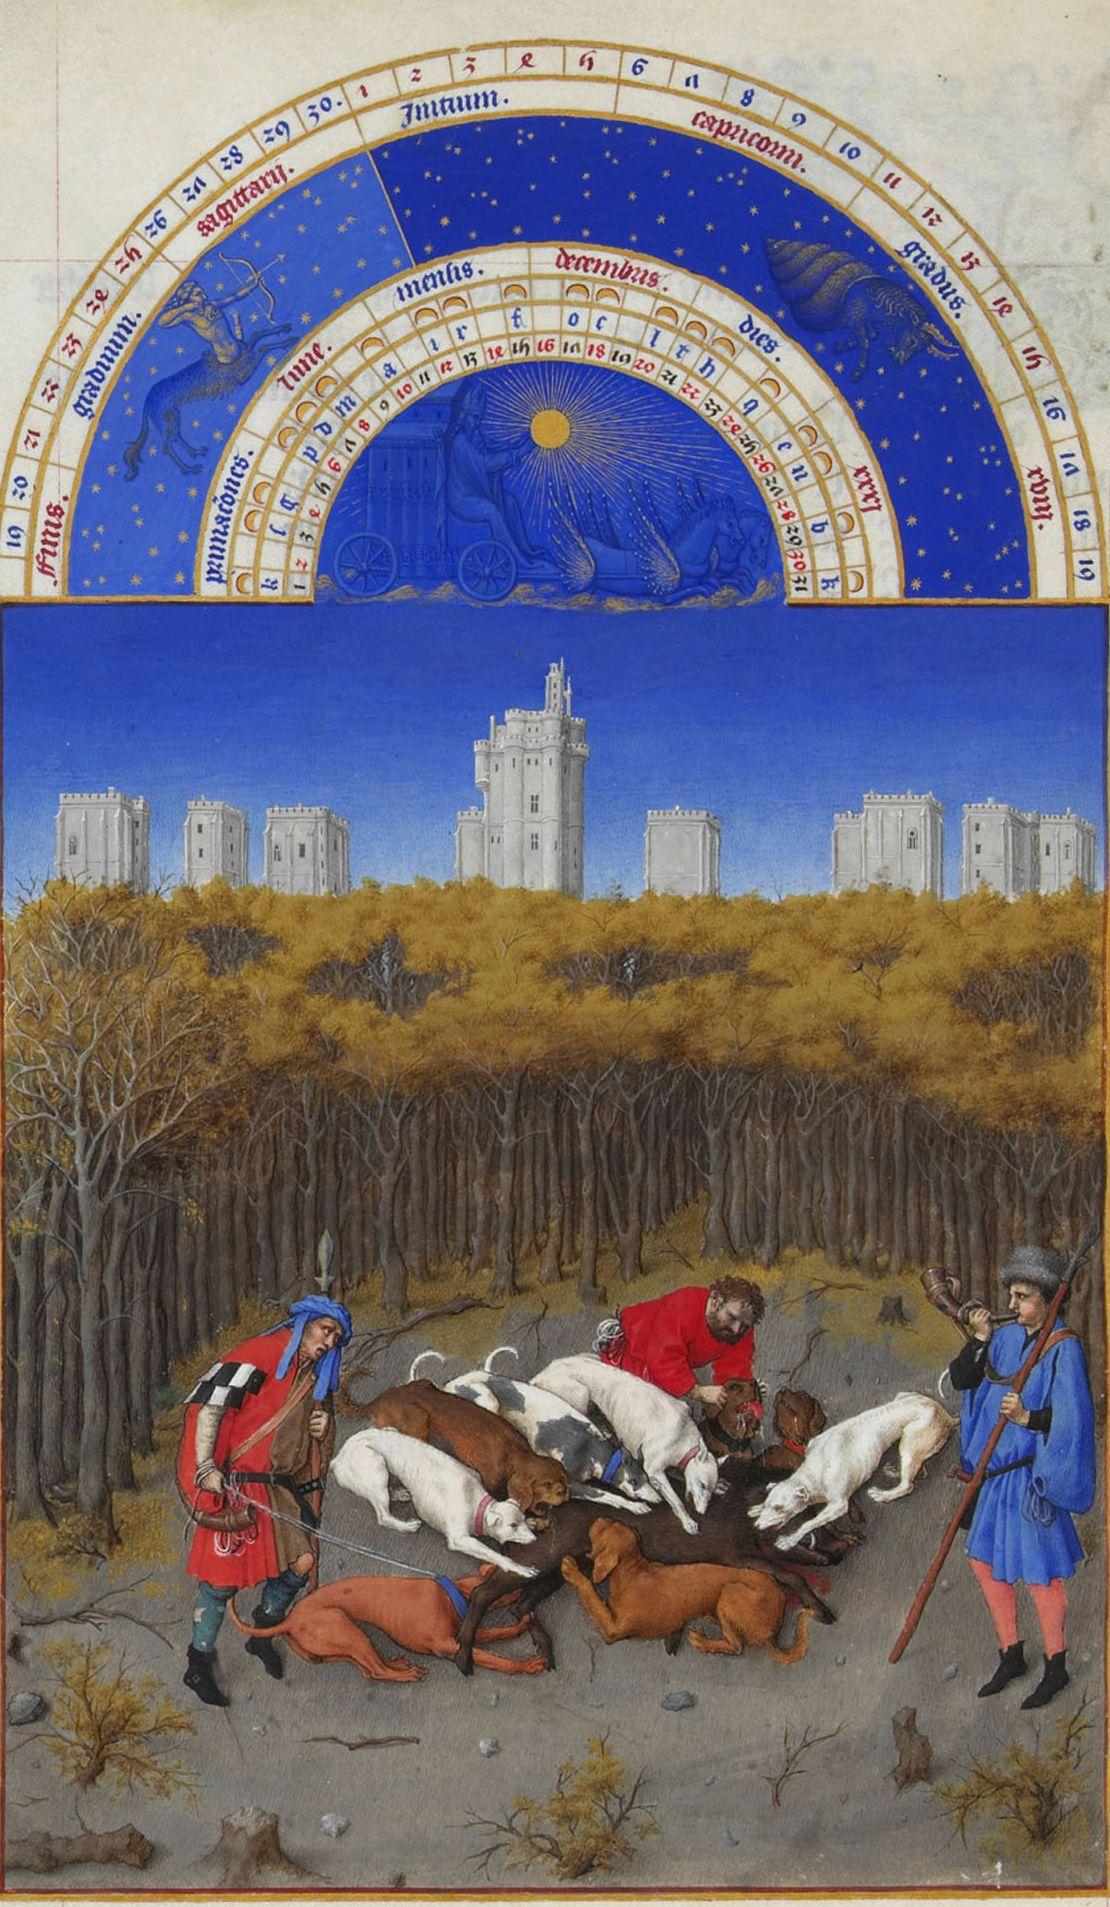 Depiction of Diciembre